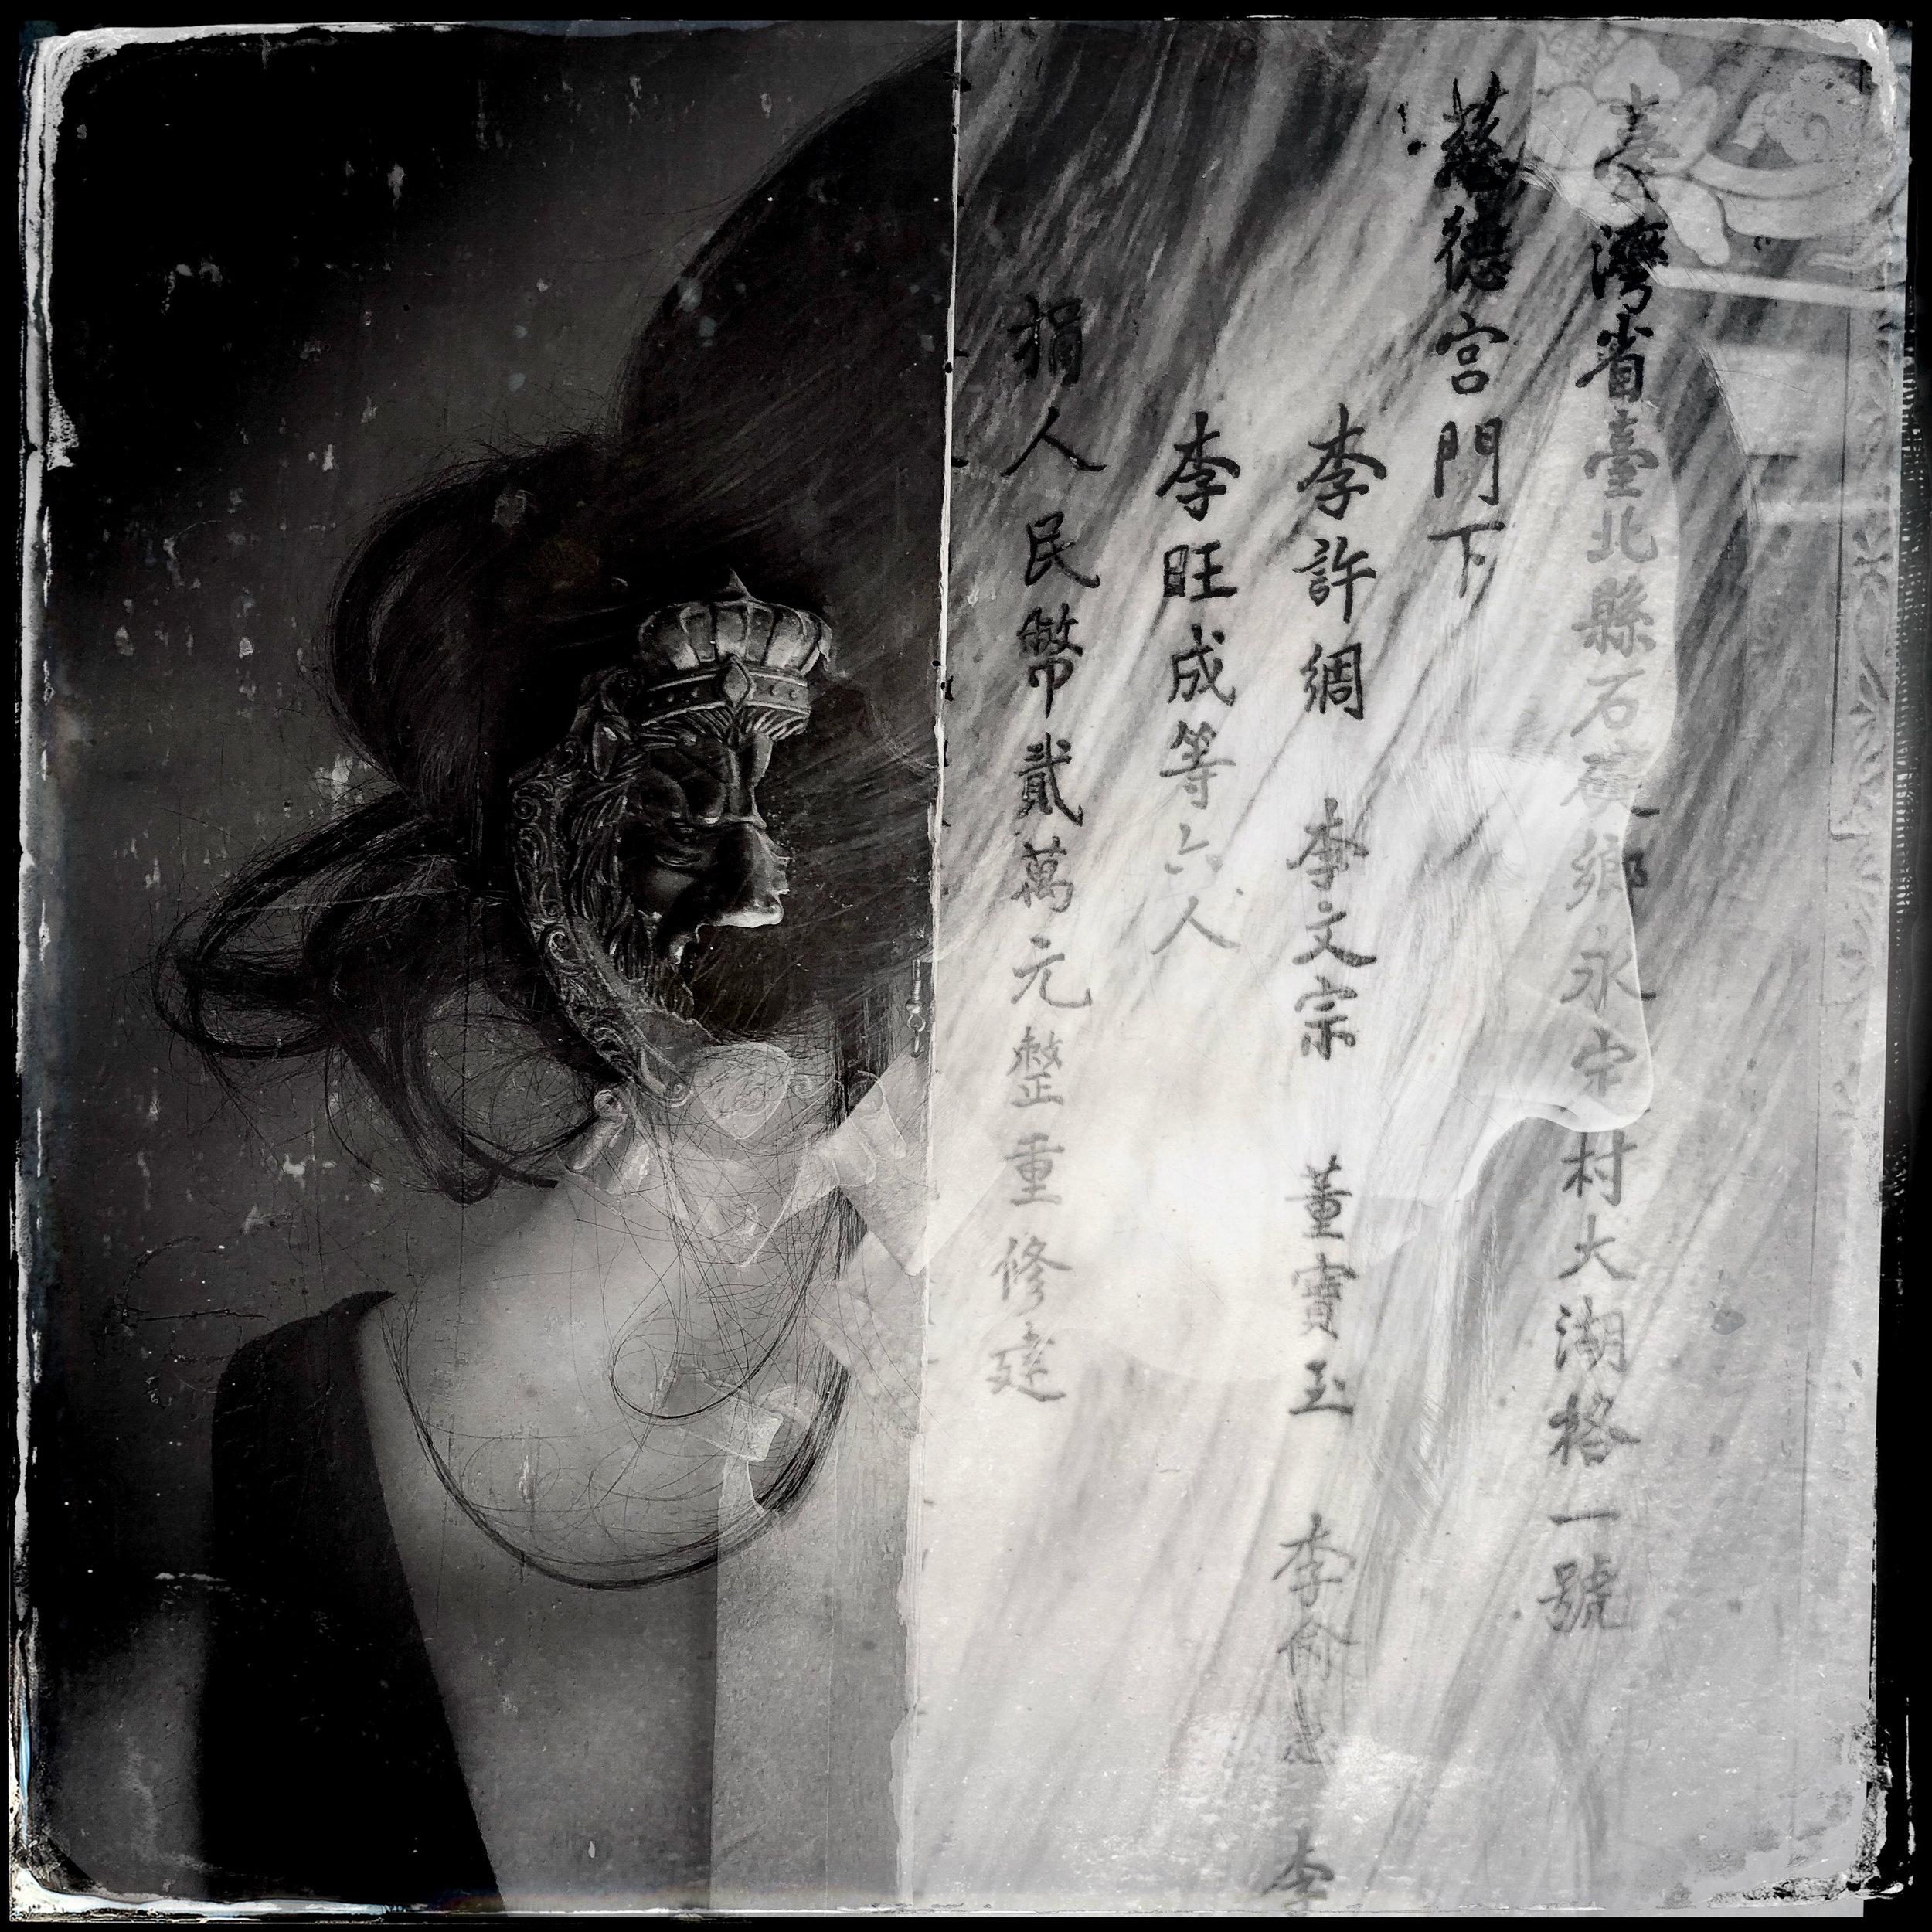 HipstamaticPhoto-574587319.747939.jpg